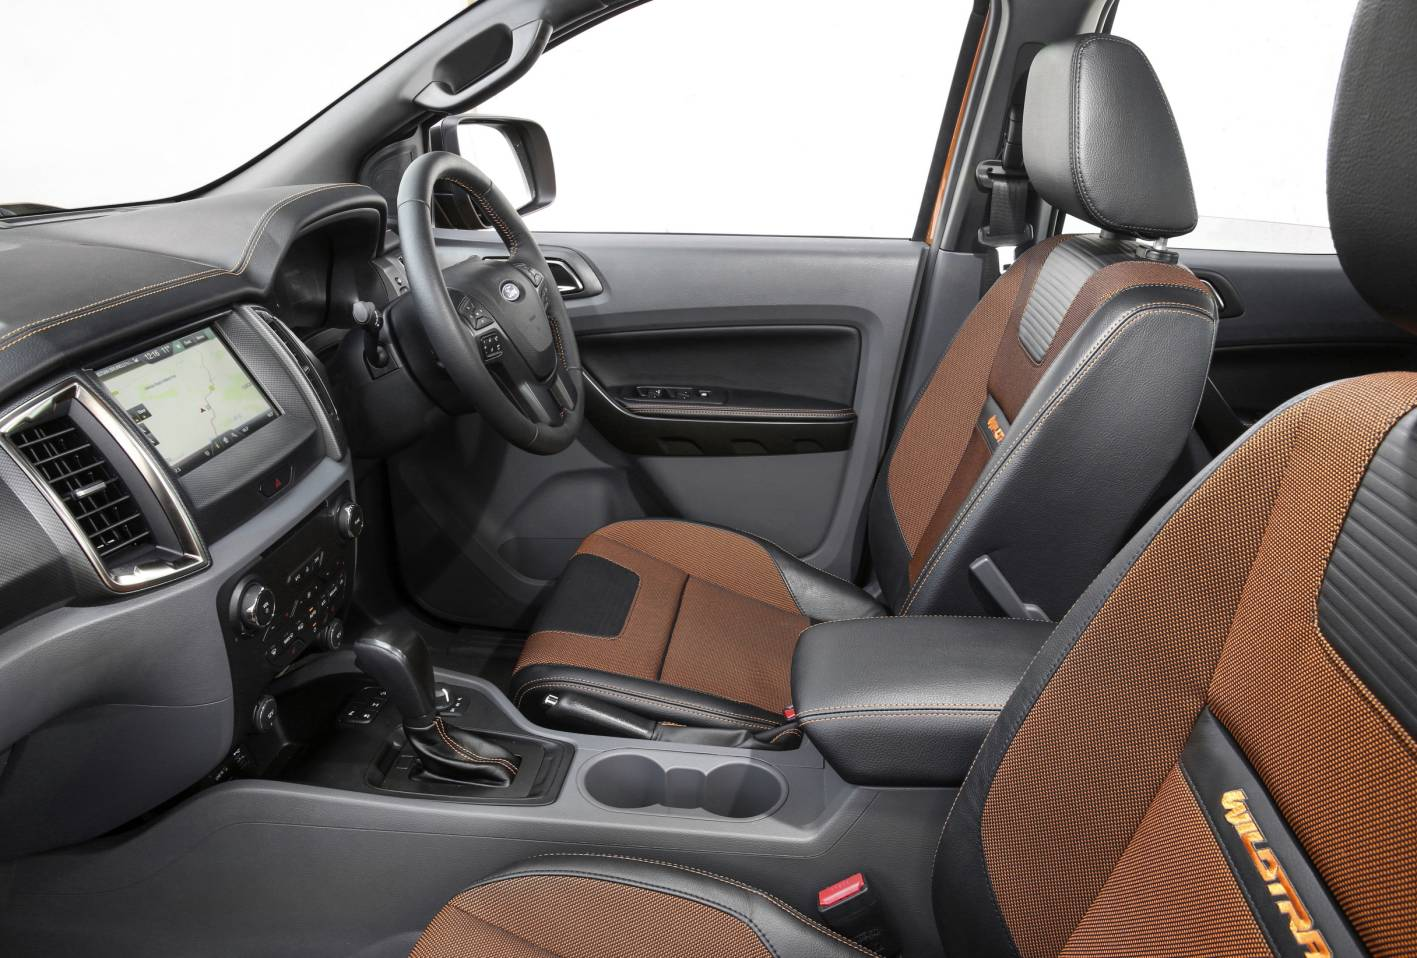 2017 ford ranger wildtrak review top10cars. Black Bedroom Furniture Sets. Home Design Ideas